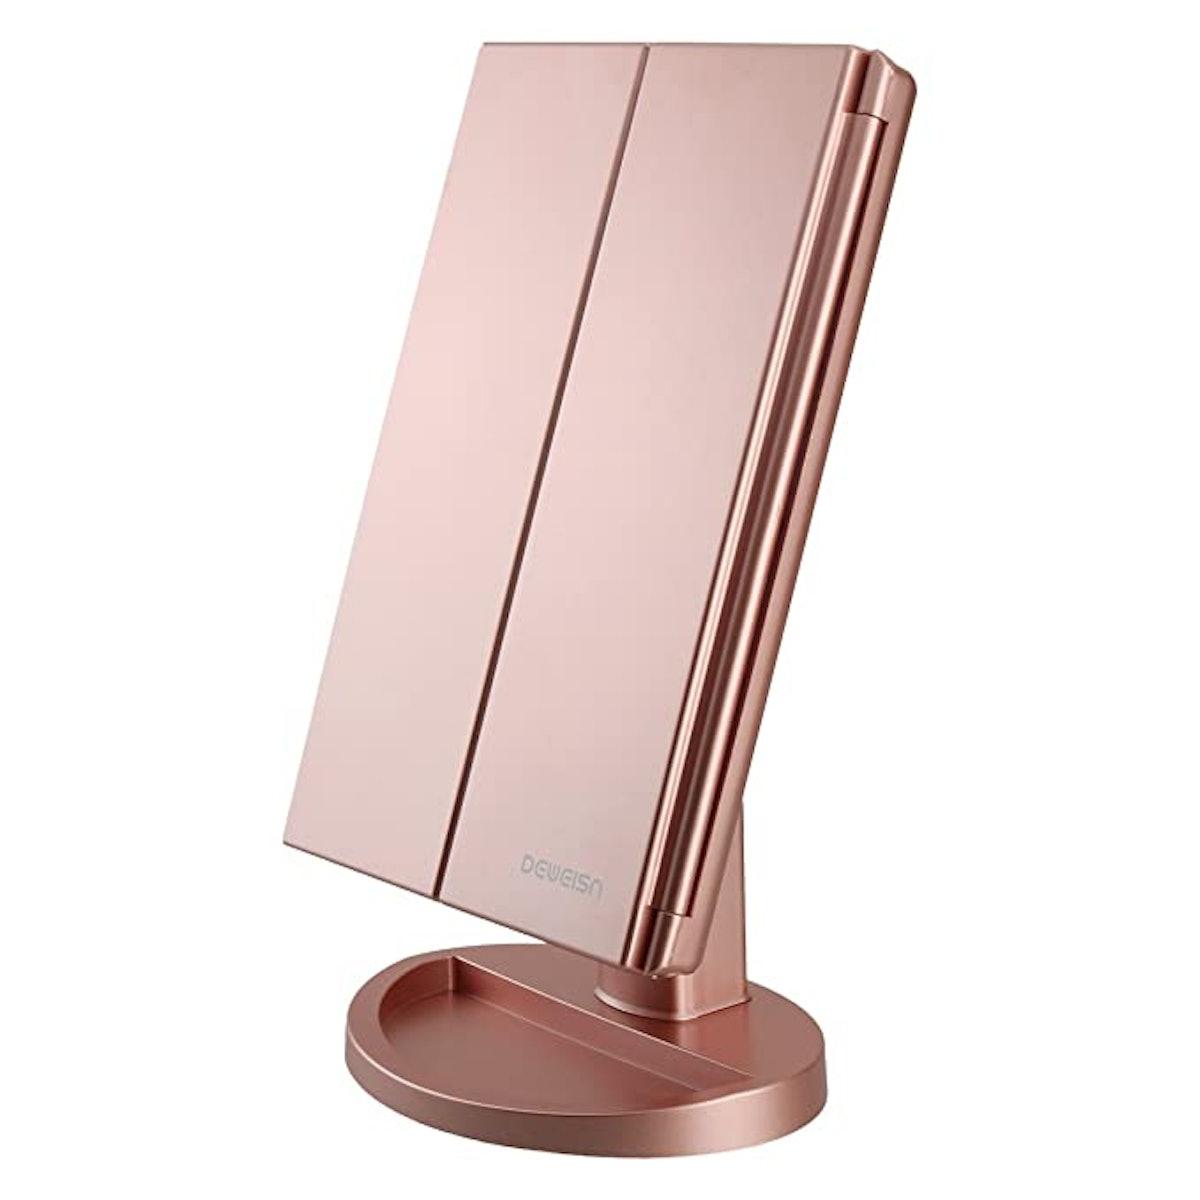 Deweisn Tri-Fold Vanity Mirror with 21 LED Lights